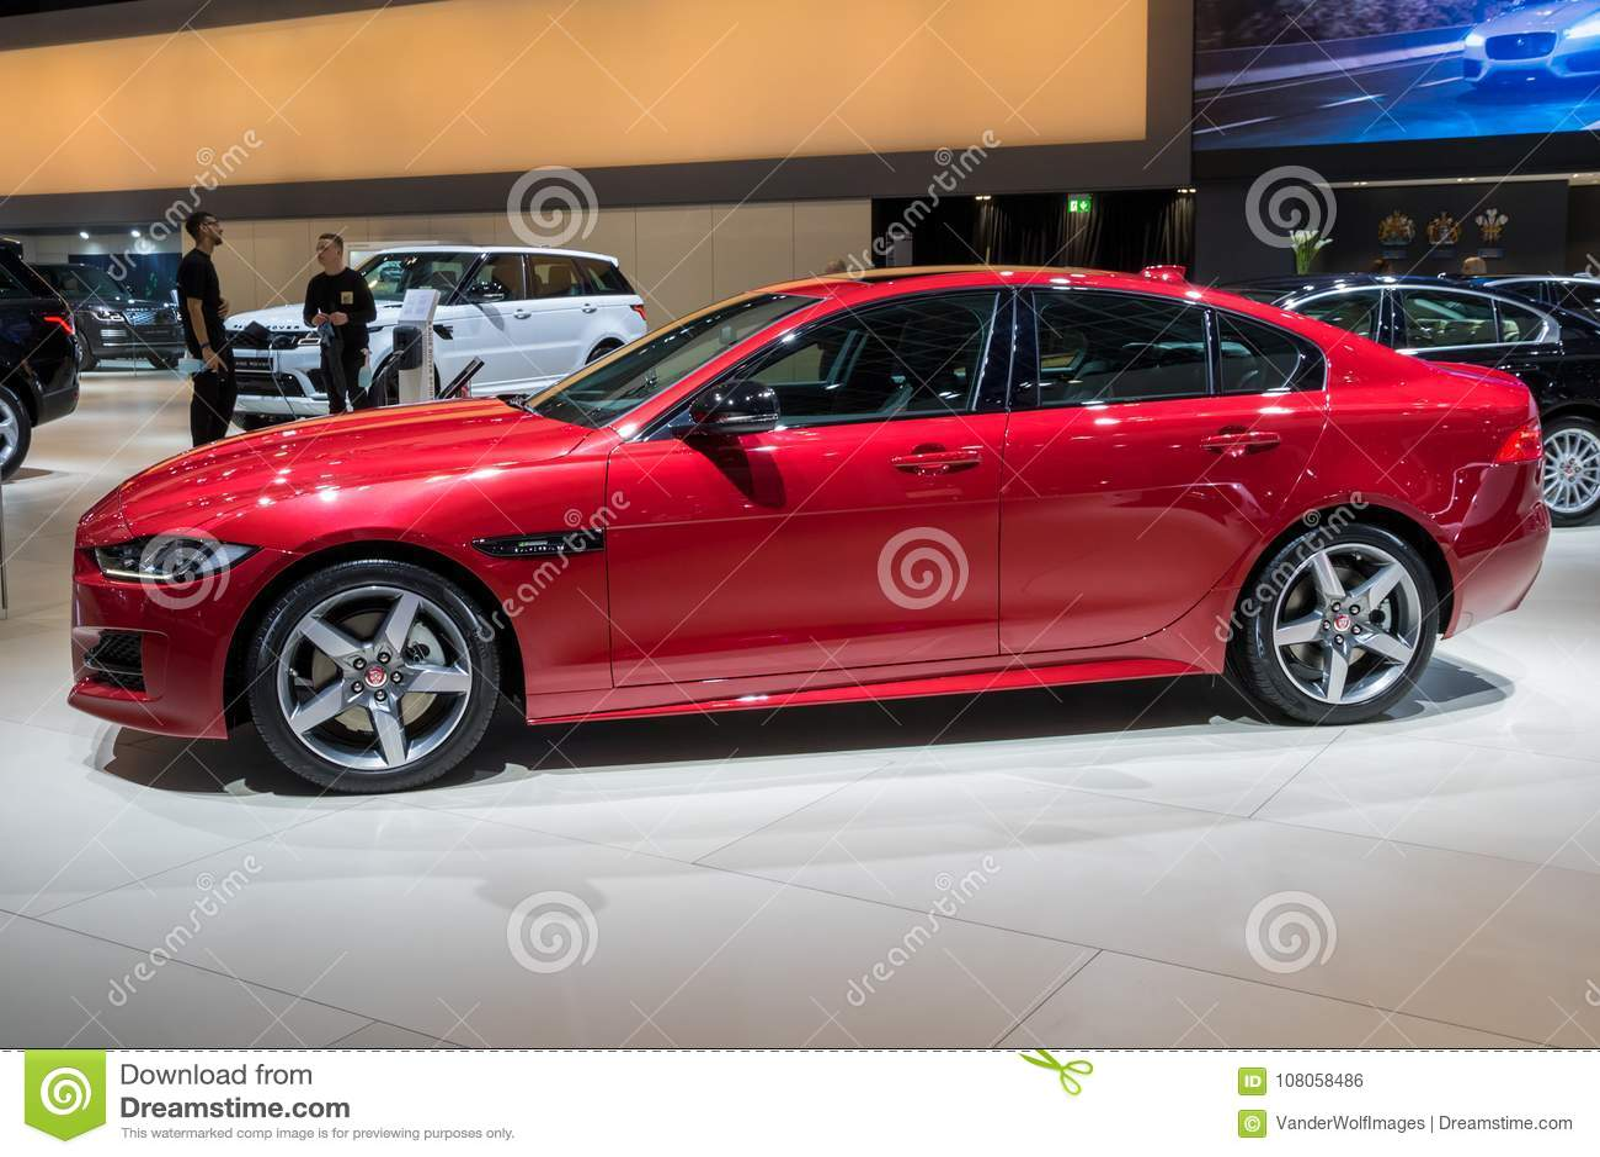 Jaguar XE Compact Executive Car Editorial Photo - Image of model, modern: 108058486